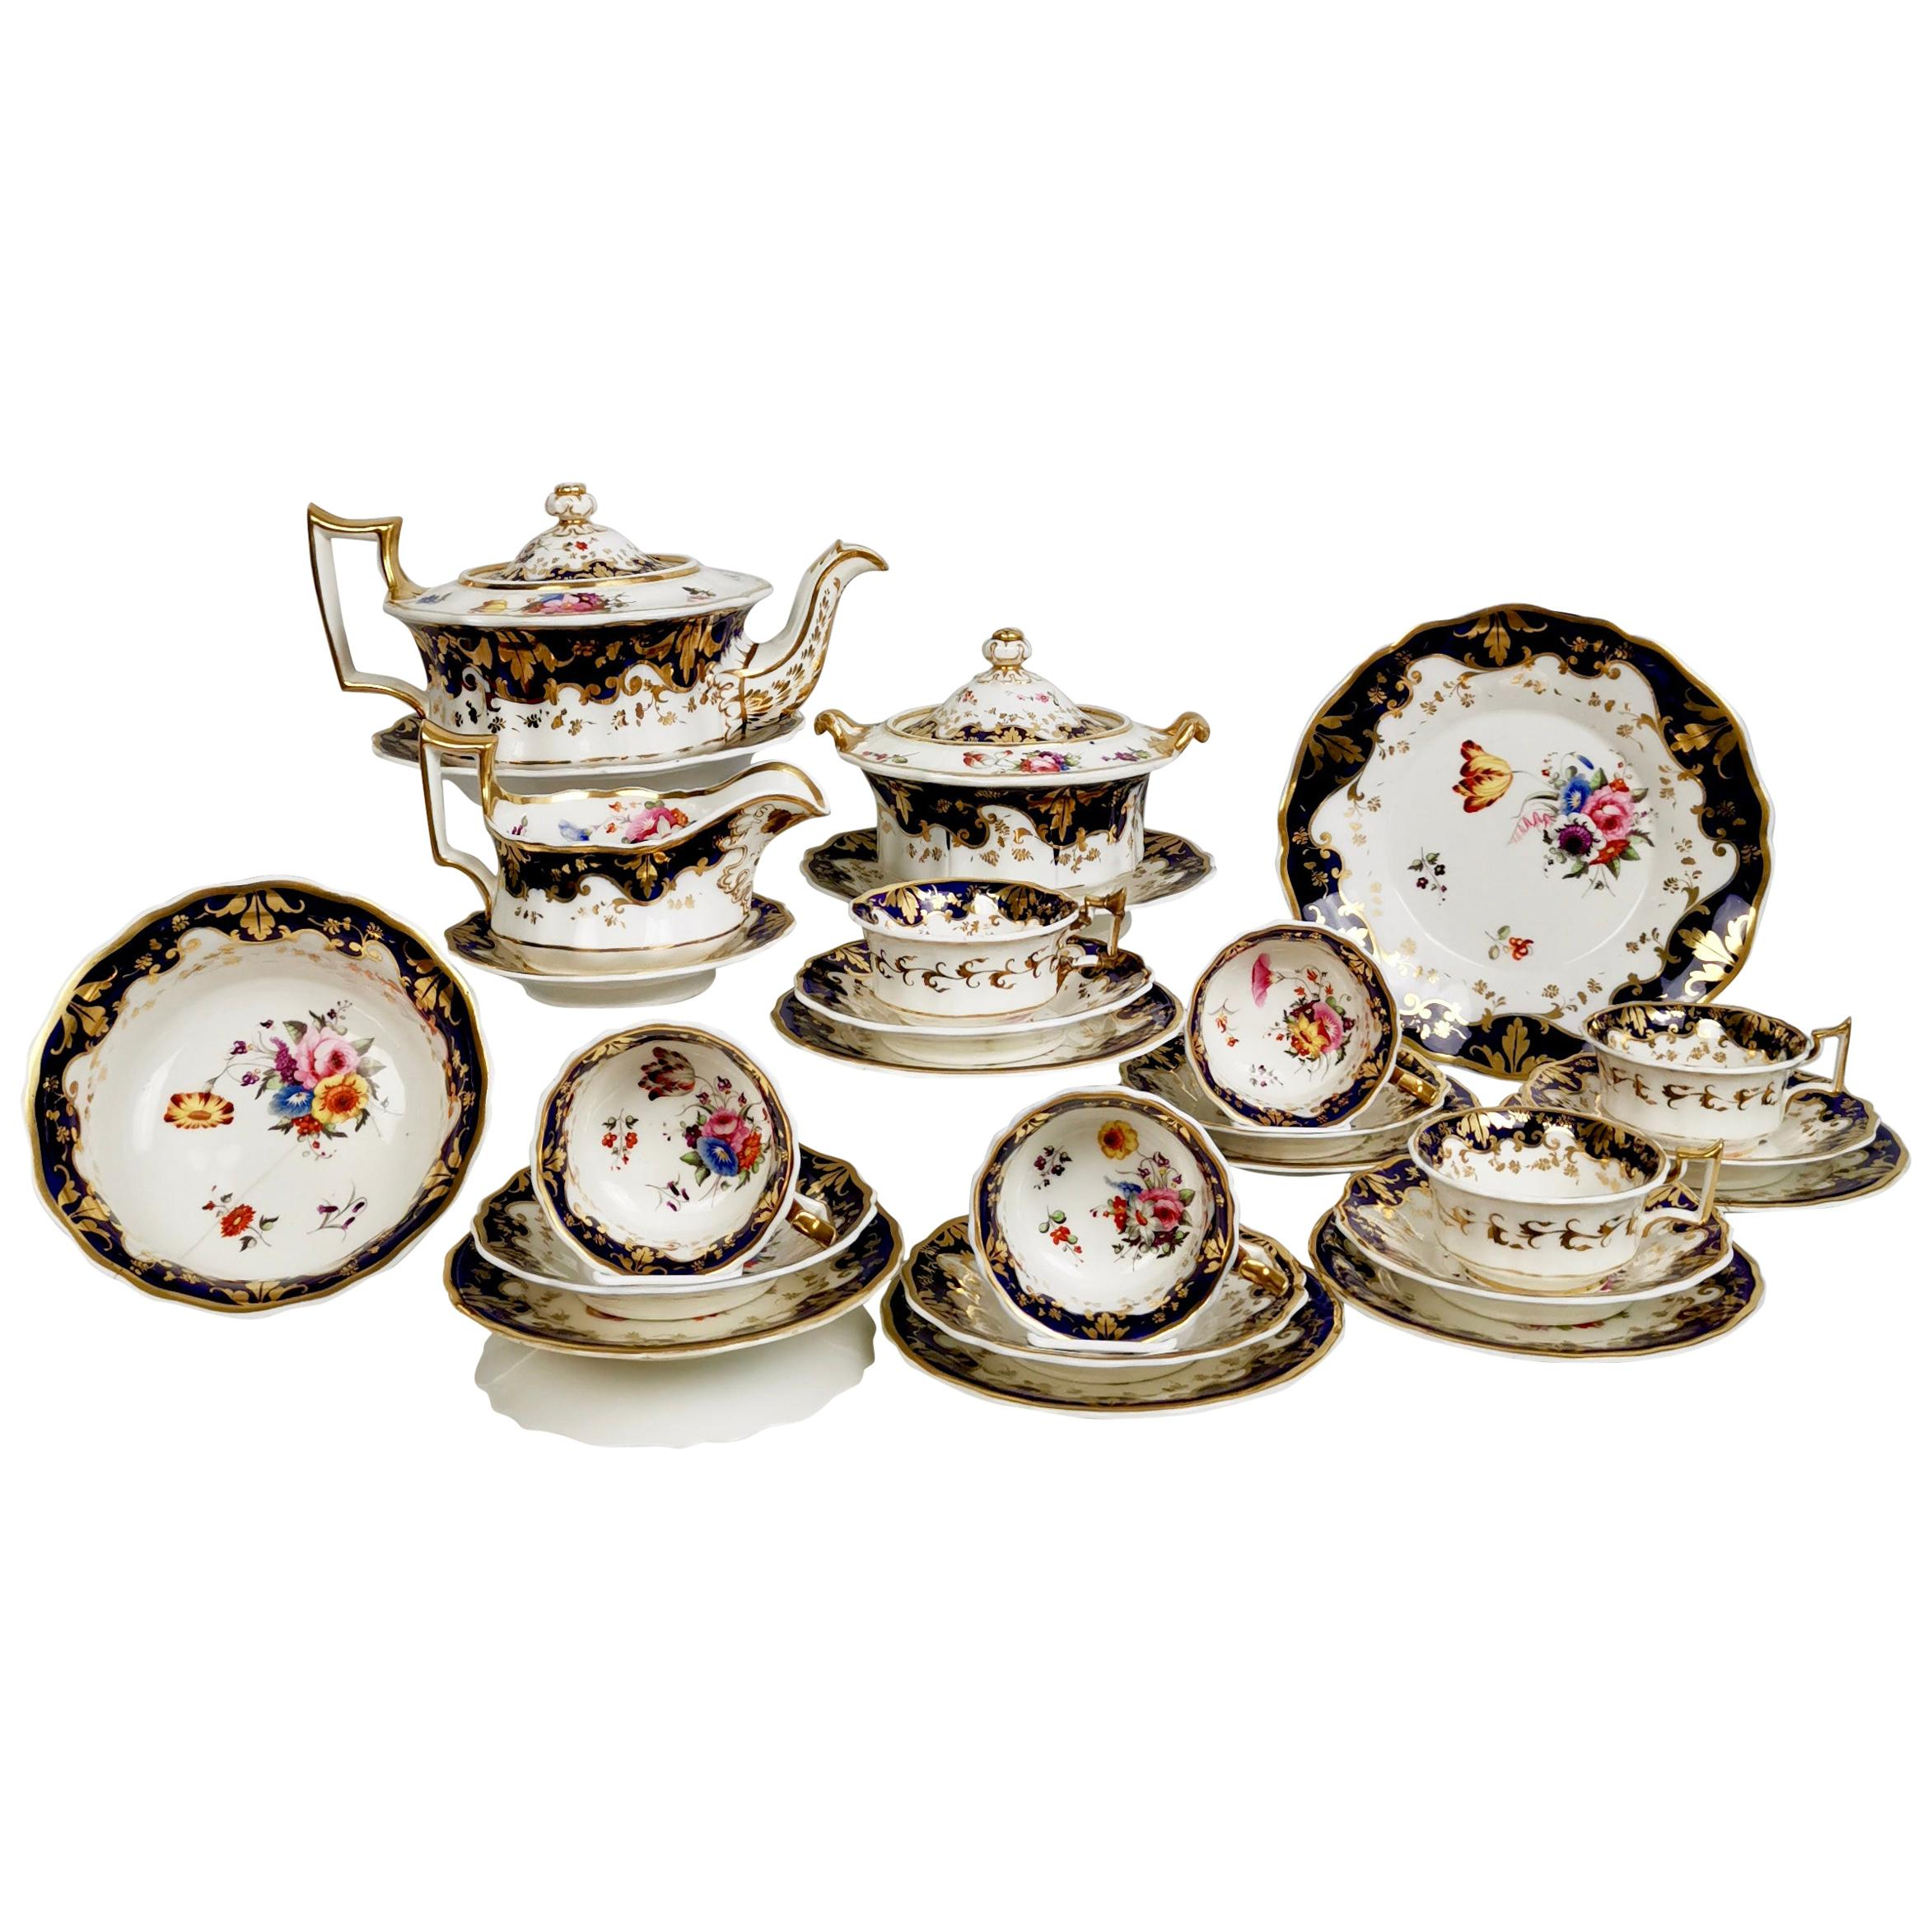 Ridgway Porcelain Tea Service, Flowers on Cobalt Blue and Gilt, Regency ca 1825